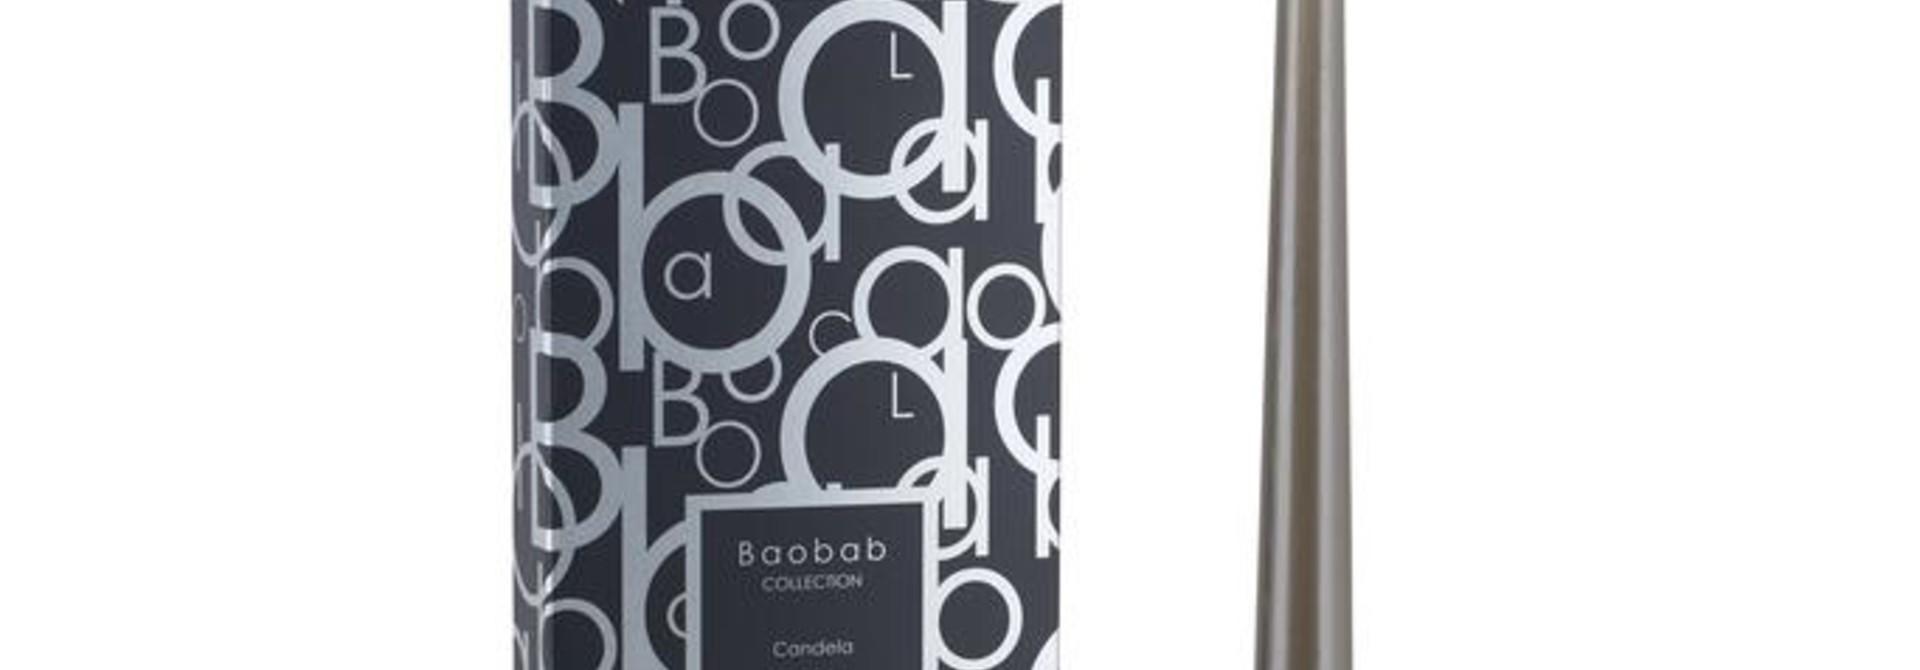 BAOBAB COLLECTION - Candela Sticks Taupe